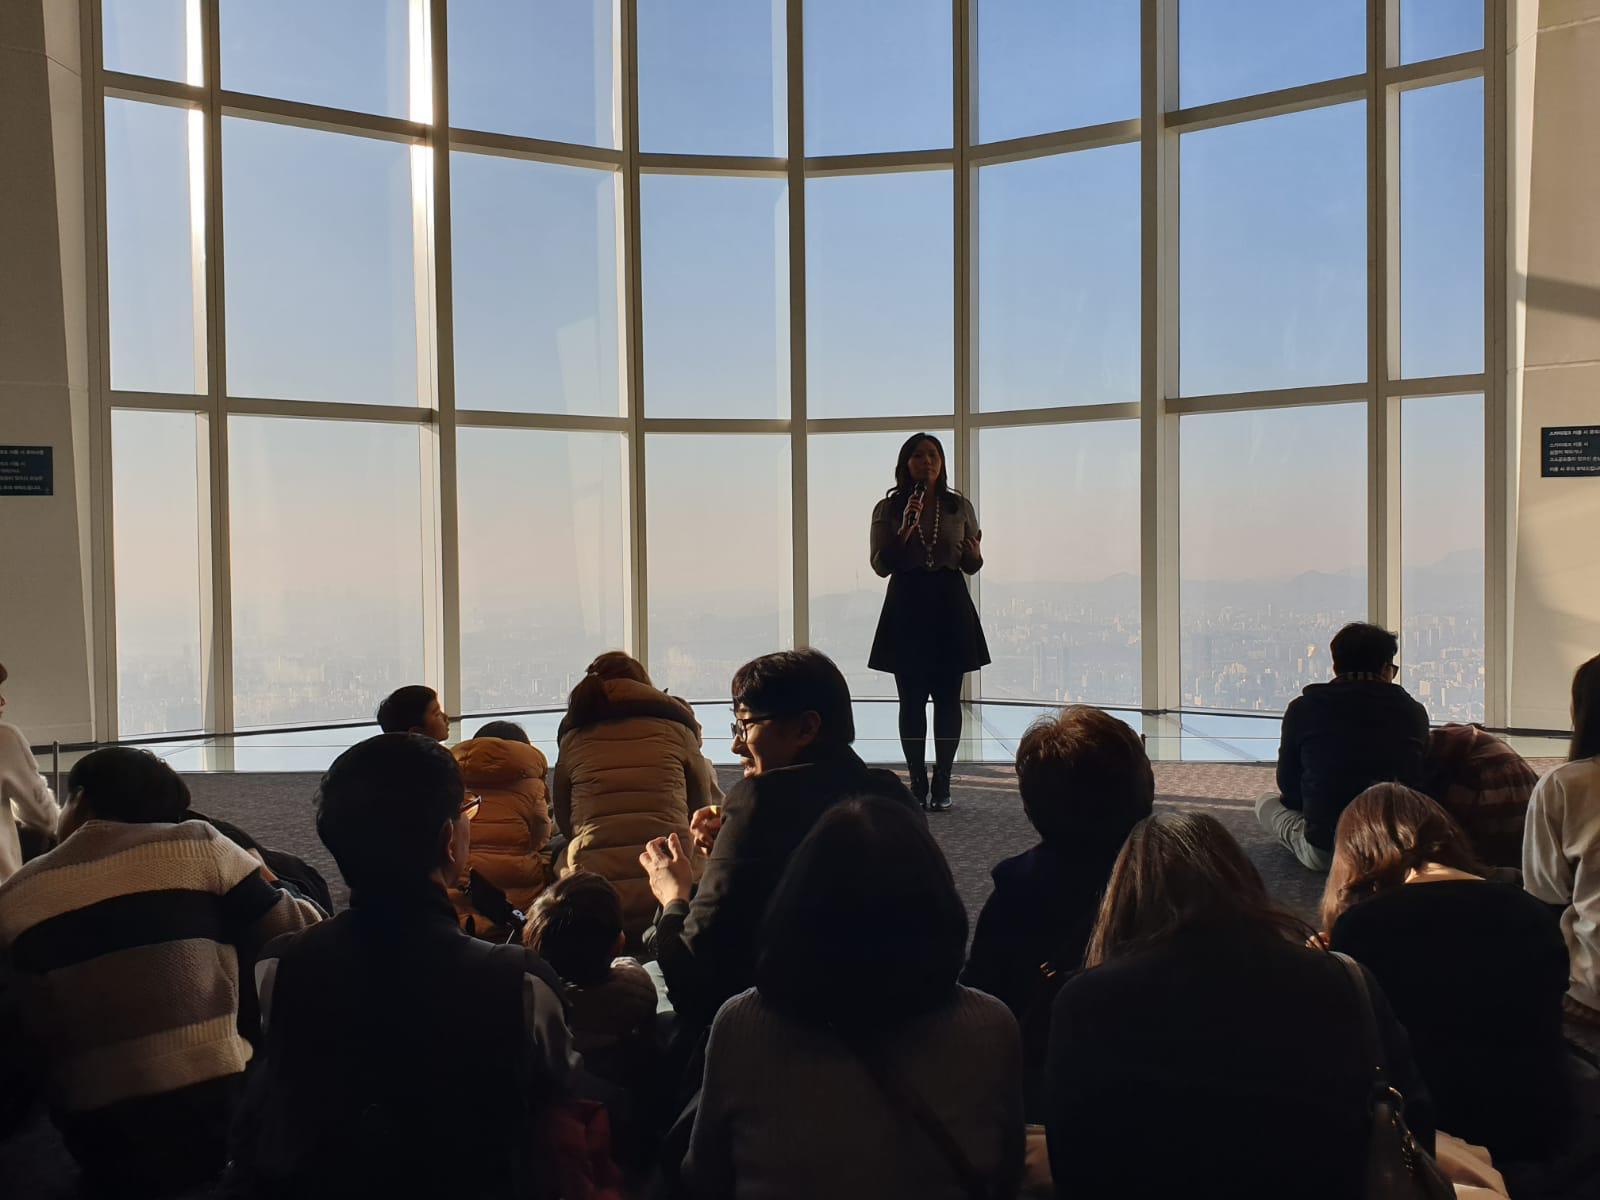 Livi Zheng berbicara di geudng tertinggi di Korea Selatan | Sumber: Dokumentasi Livi Zheng